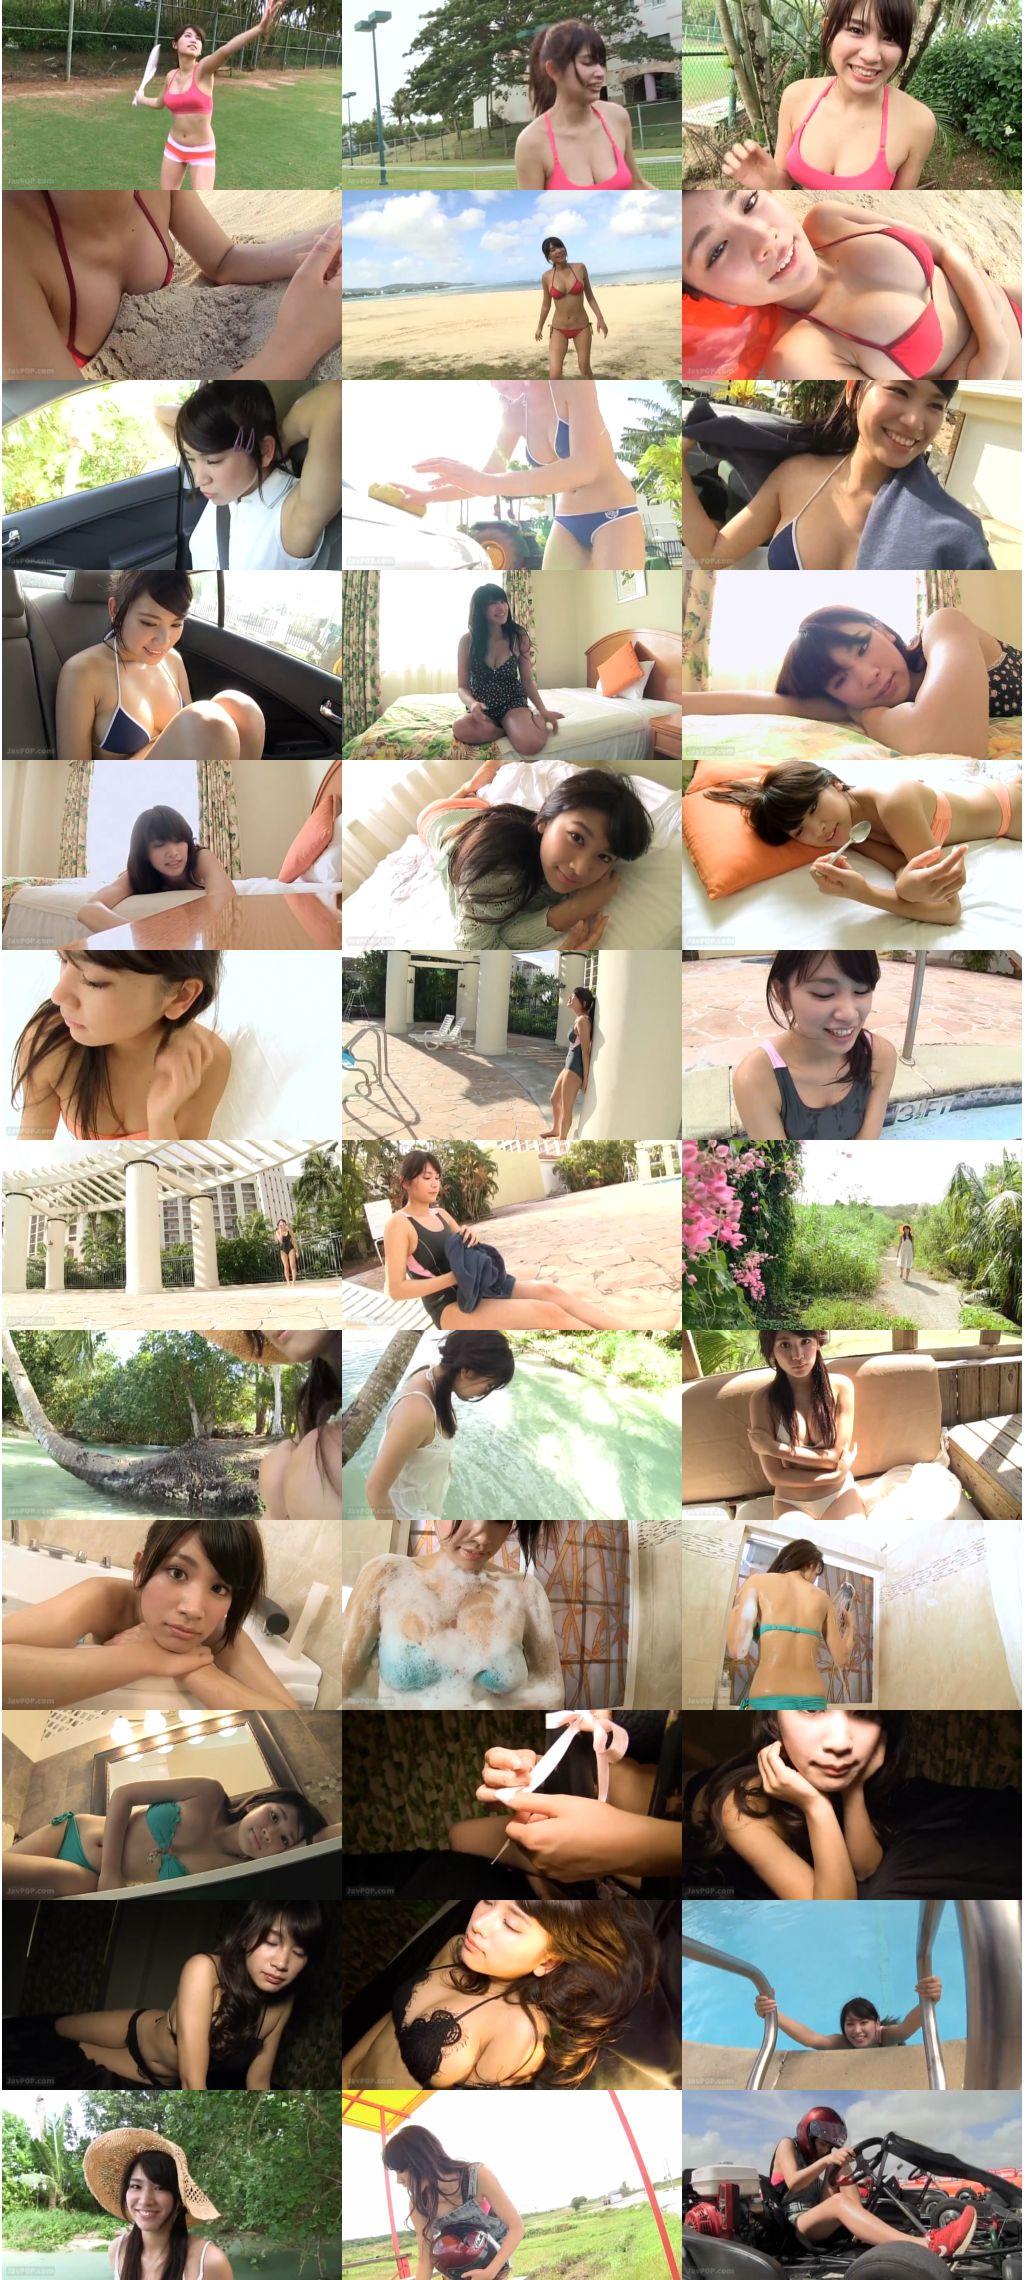 lpfd 285 ikumi hisamatsu s - [LPFD-285] 久松郁実 Ikumi Hisamatsu – 「19(いく)」